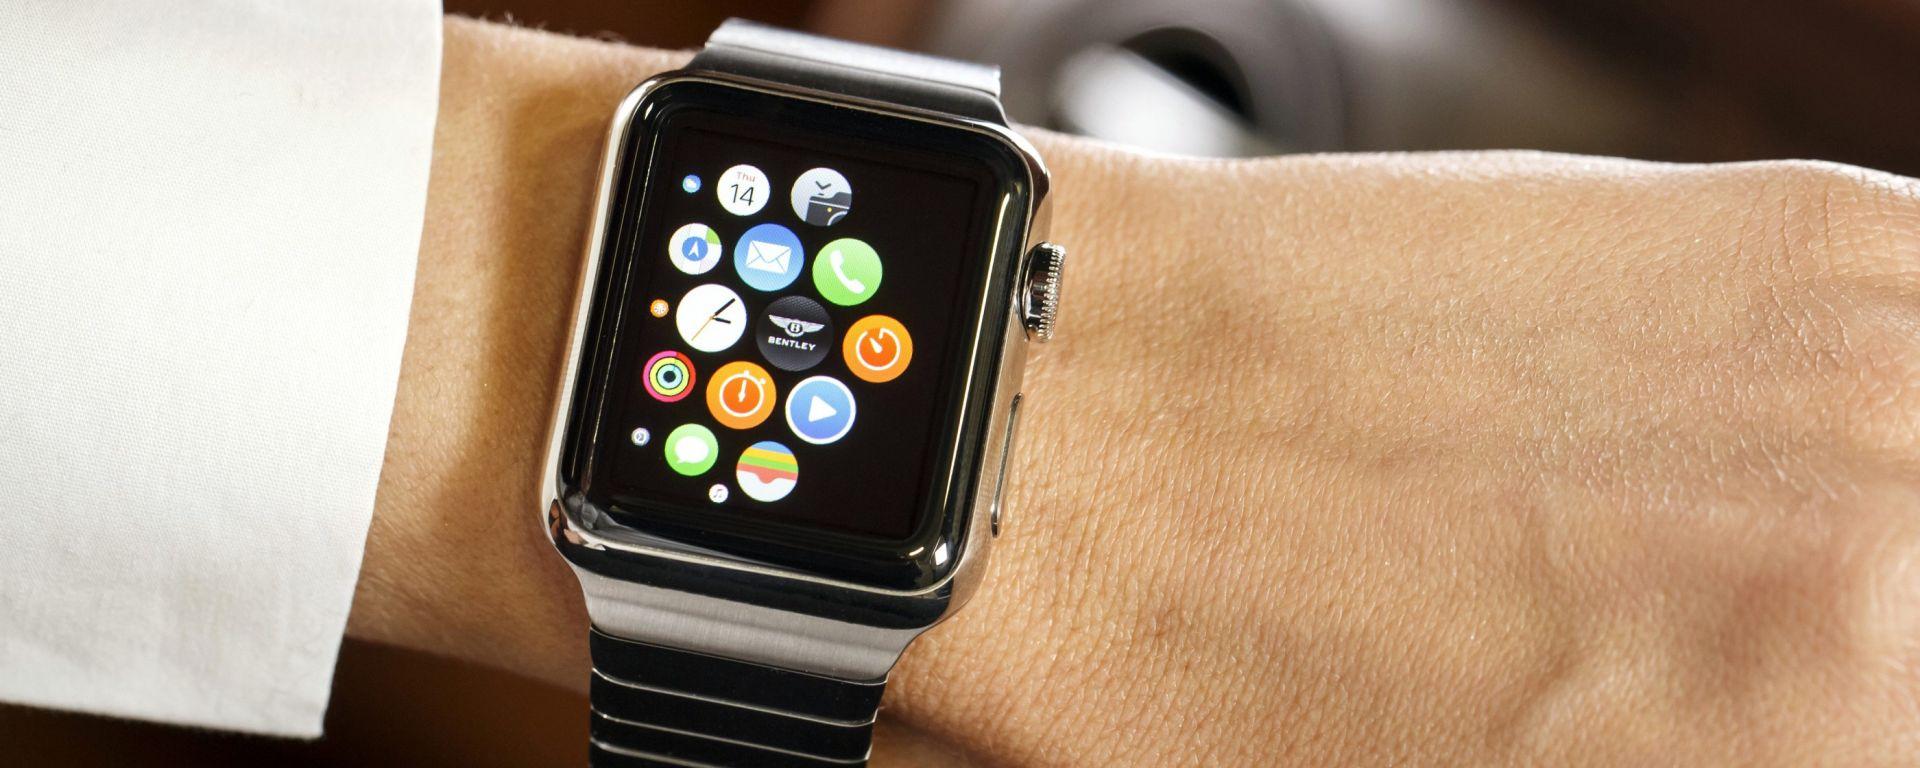 Bentley: un'App per l'Apple Watch dedicata alla Bentayga